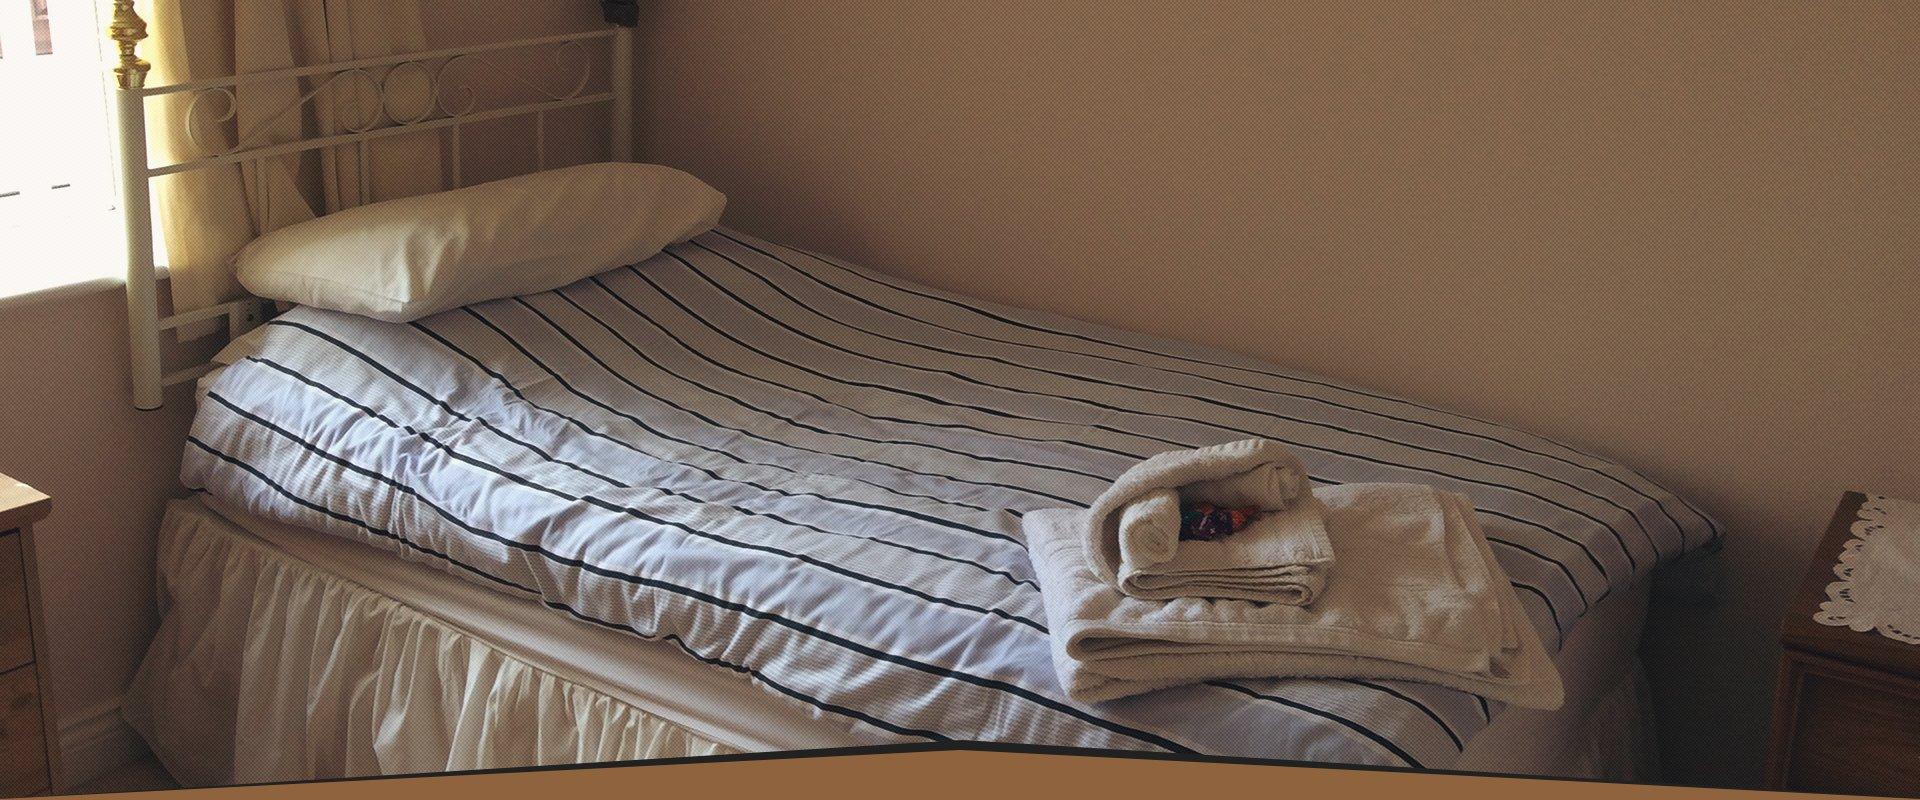 Guest room model